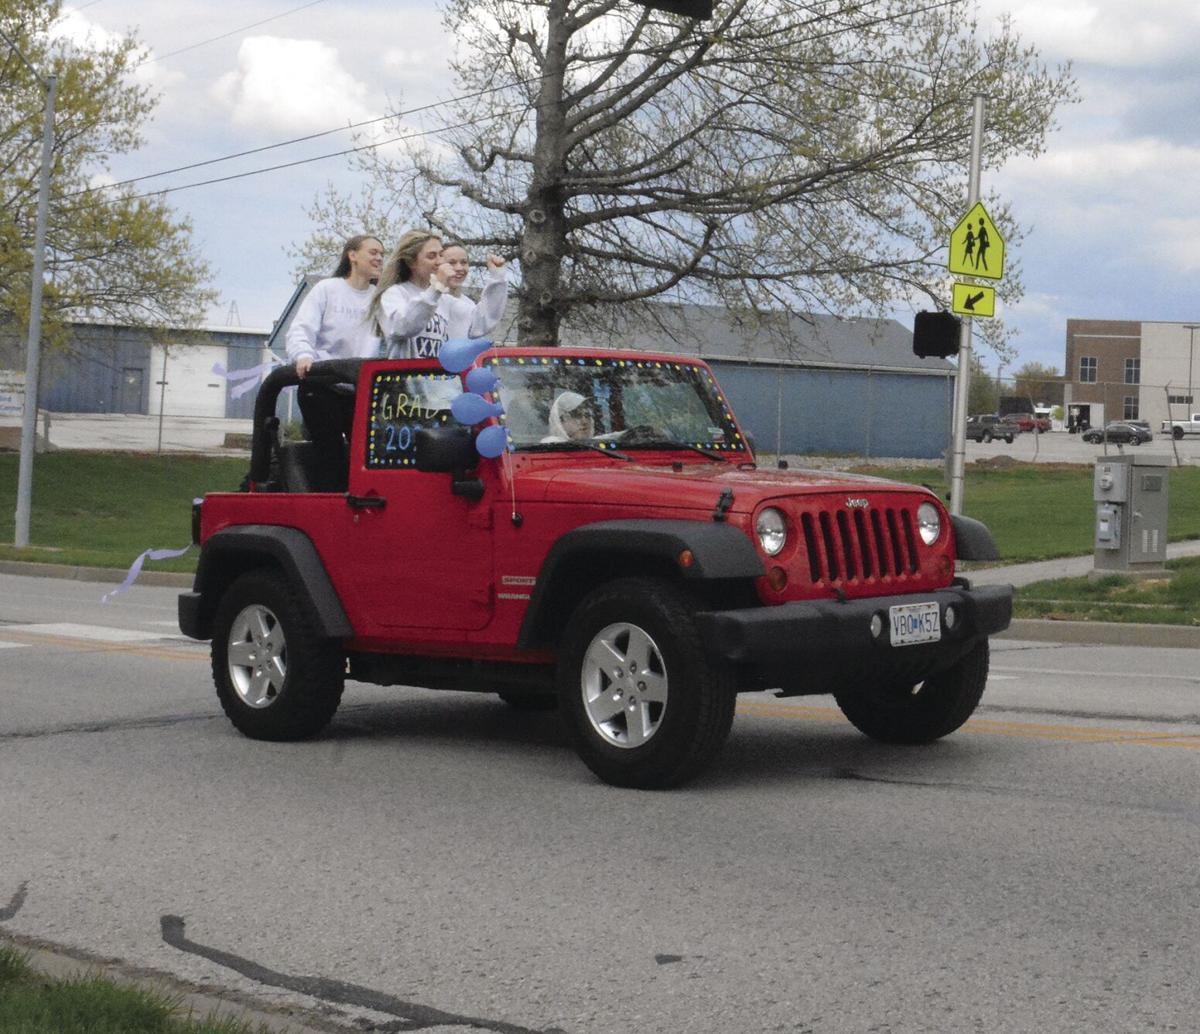 Liberty High's festive autocade 2021